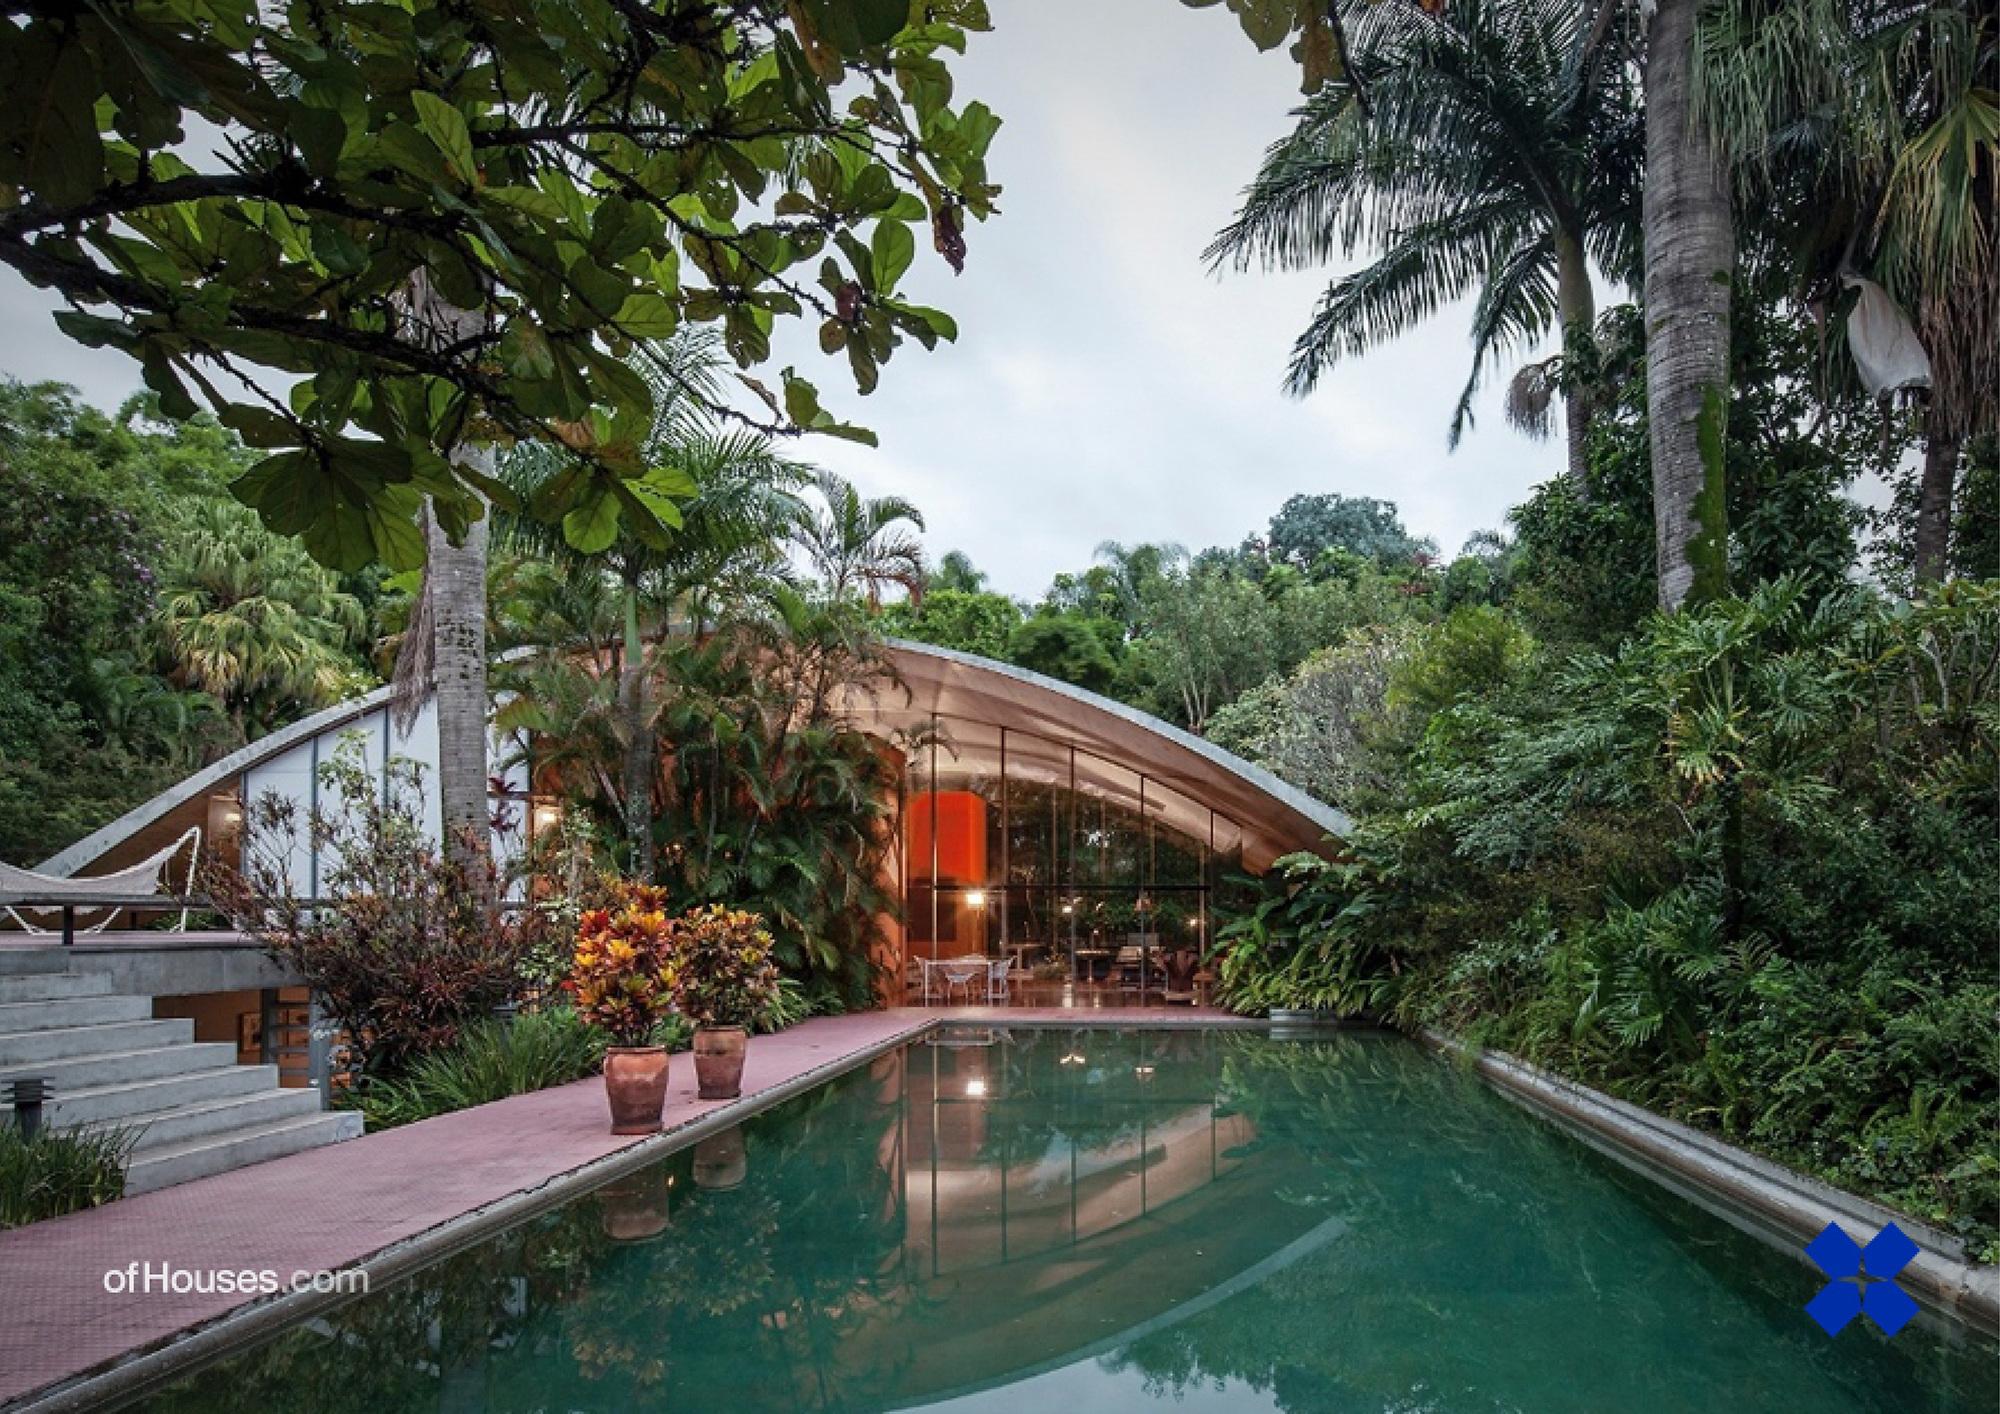 Brazilian Houses Ofhouses Ciaa